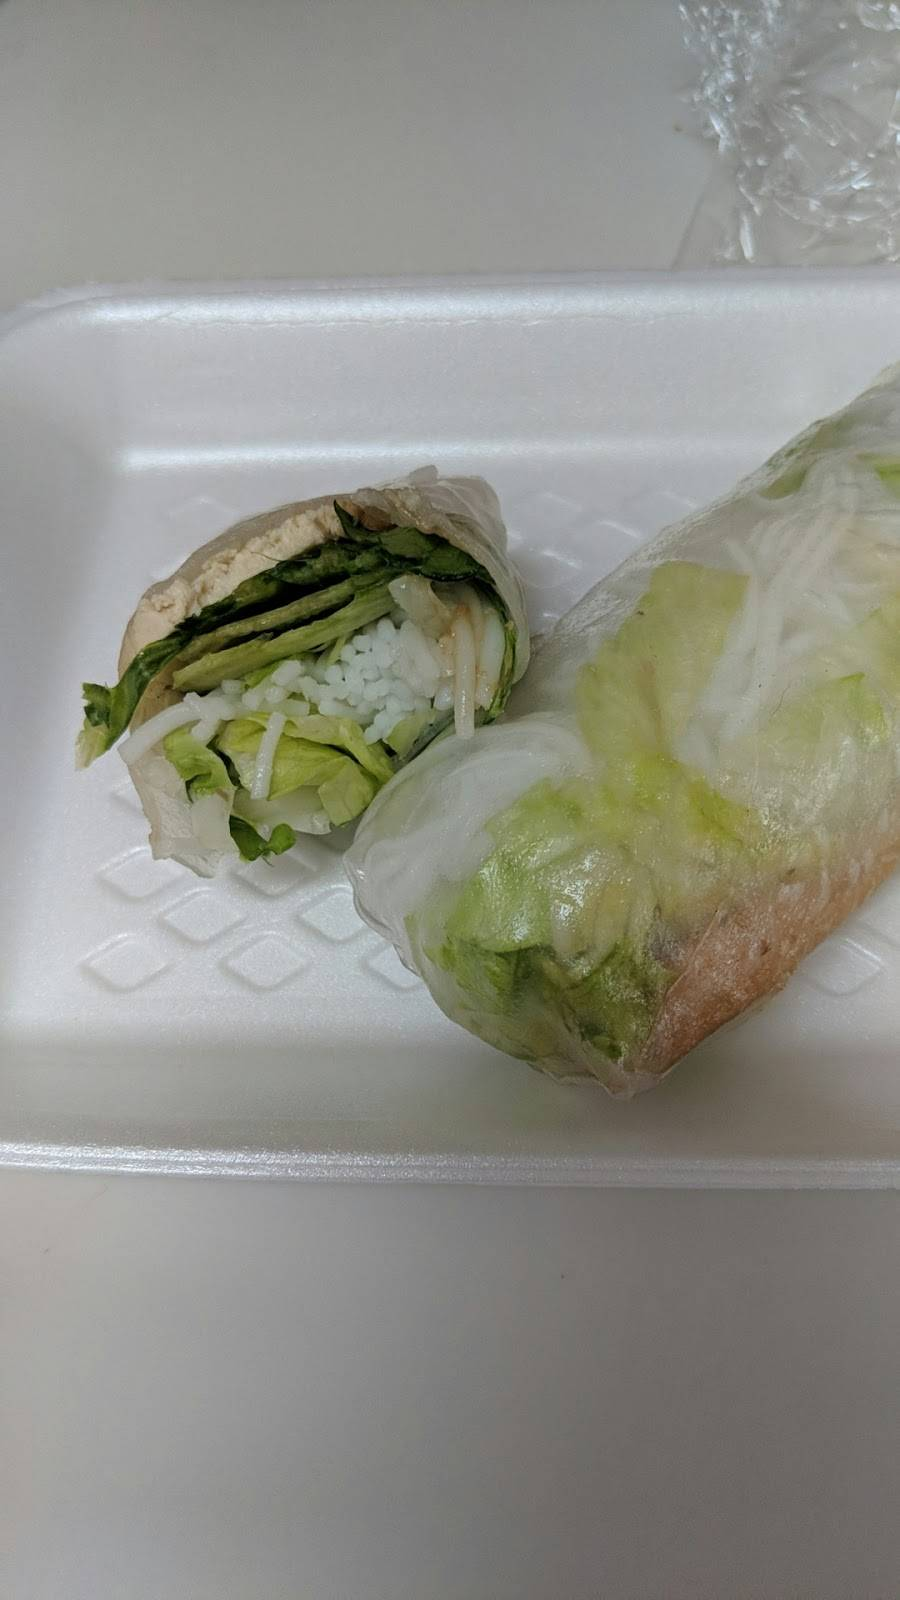 iSandwich Vietnamese Deli - meal takeaway  | Photo 10 of 10 | Address: 14705 Aurora Ave N, Shoreline, WA 98133, USA | Phone: (206) 529-3221